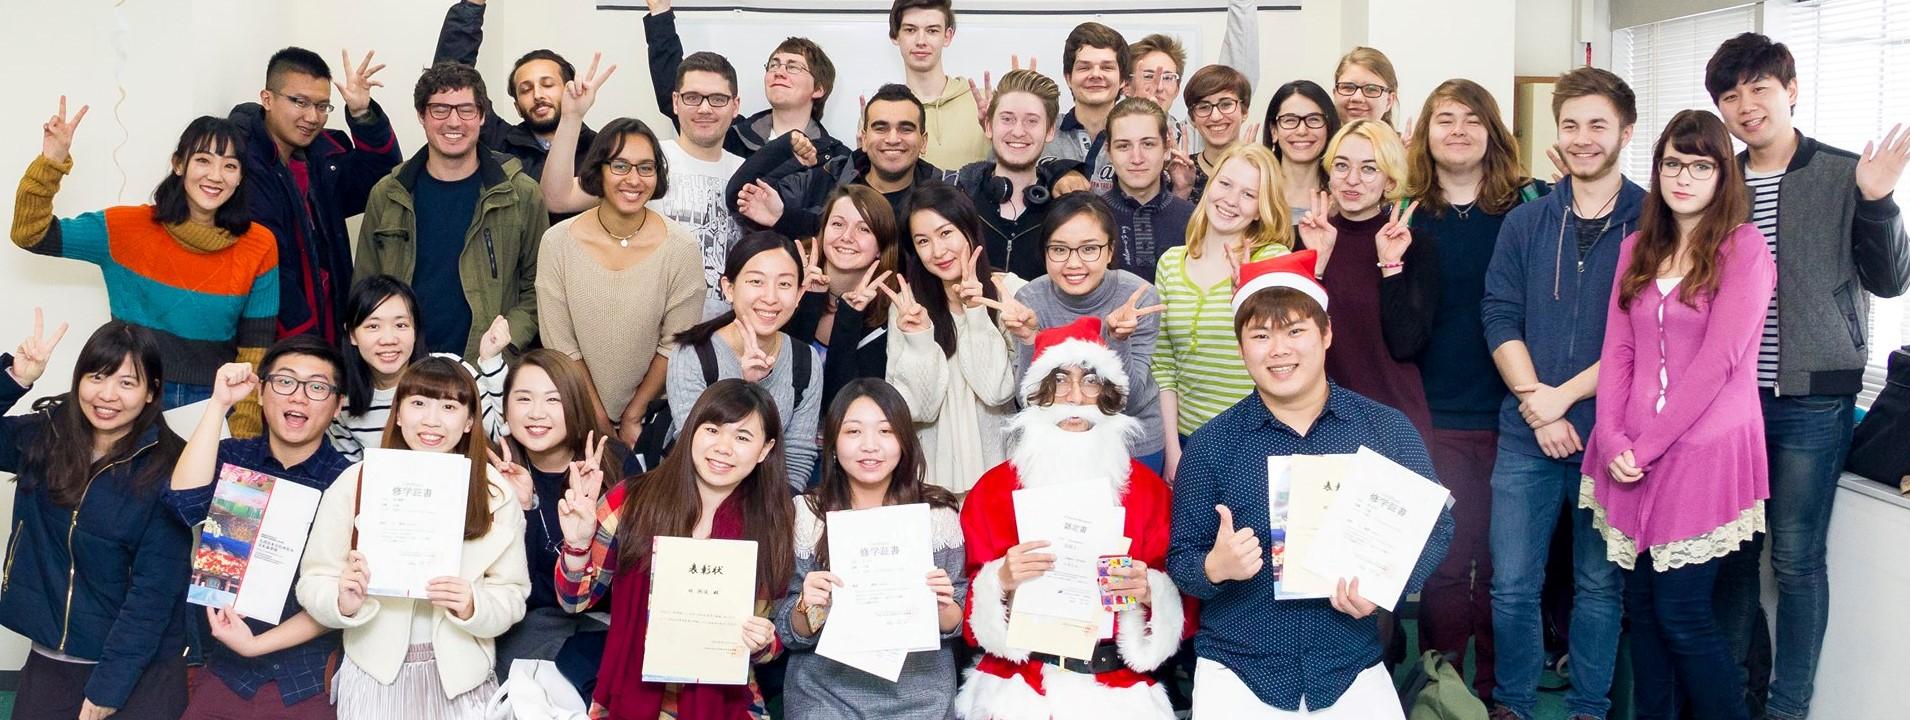 4-skills Intensive Courses - Tokyo, Kyoto, Kobe, Nagano, Fukuoka & more!